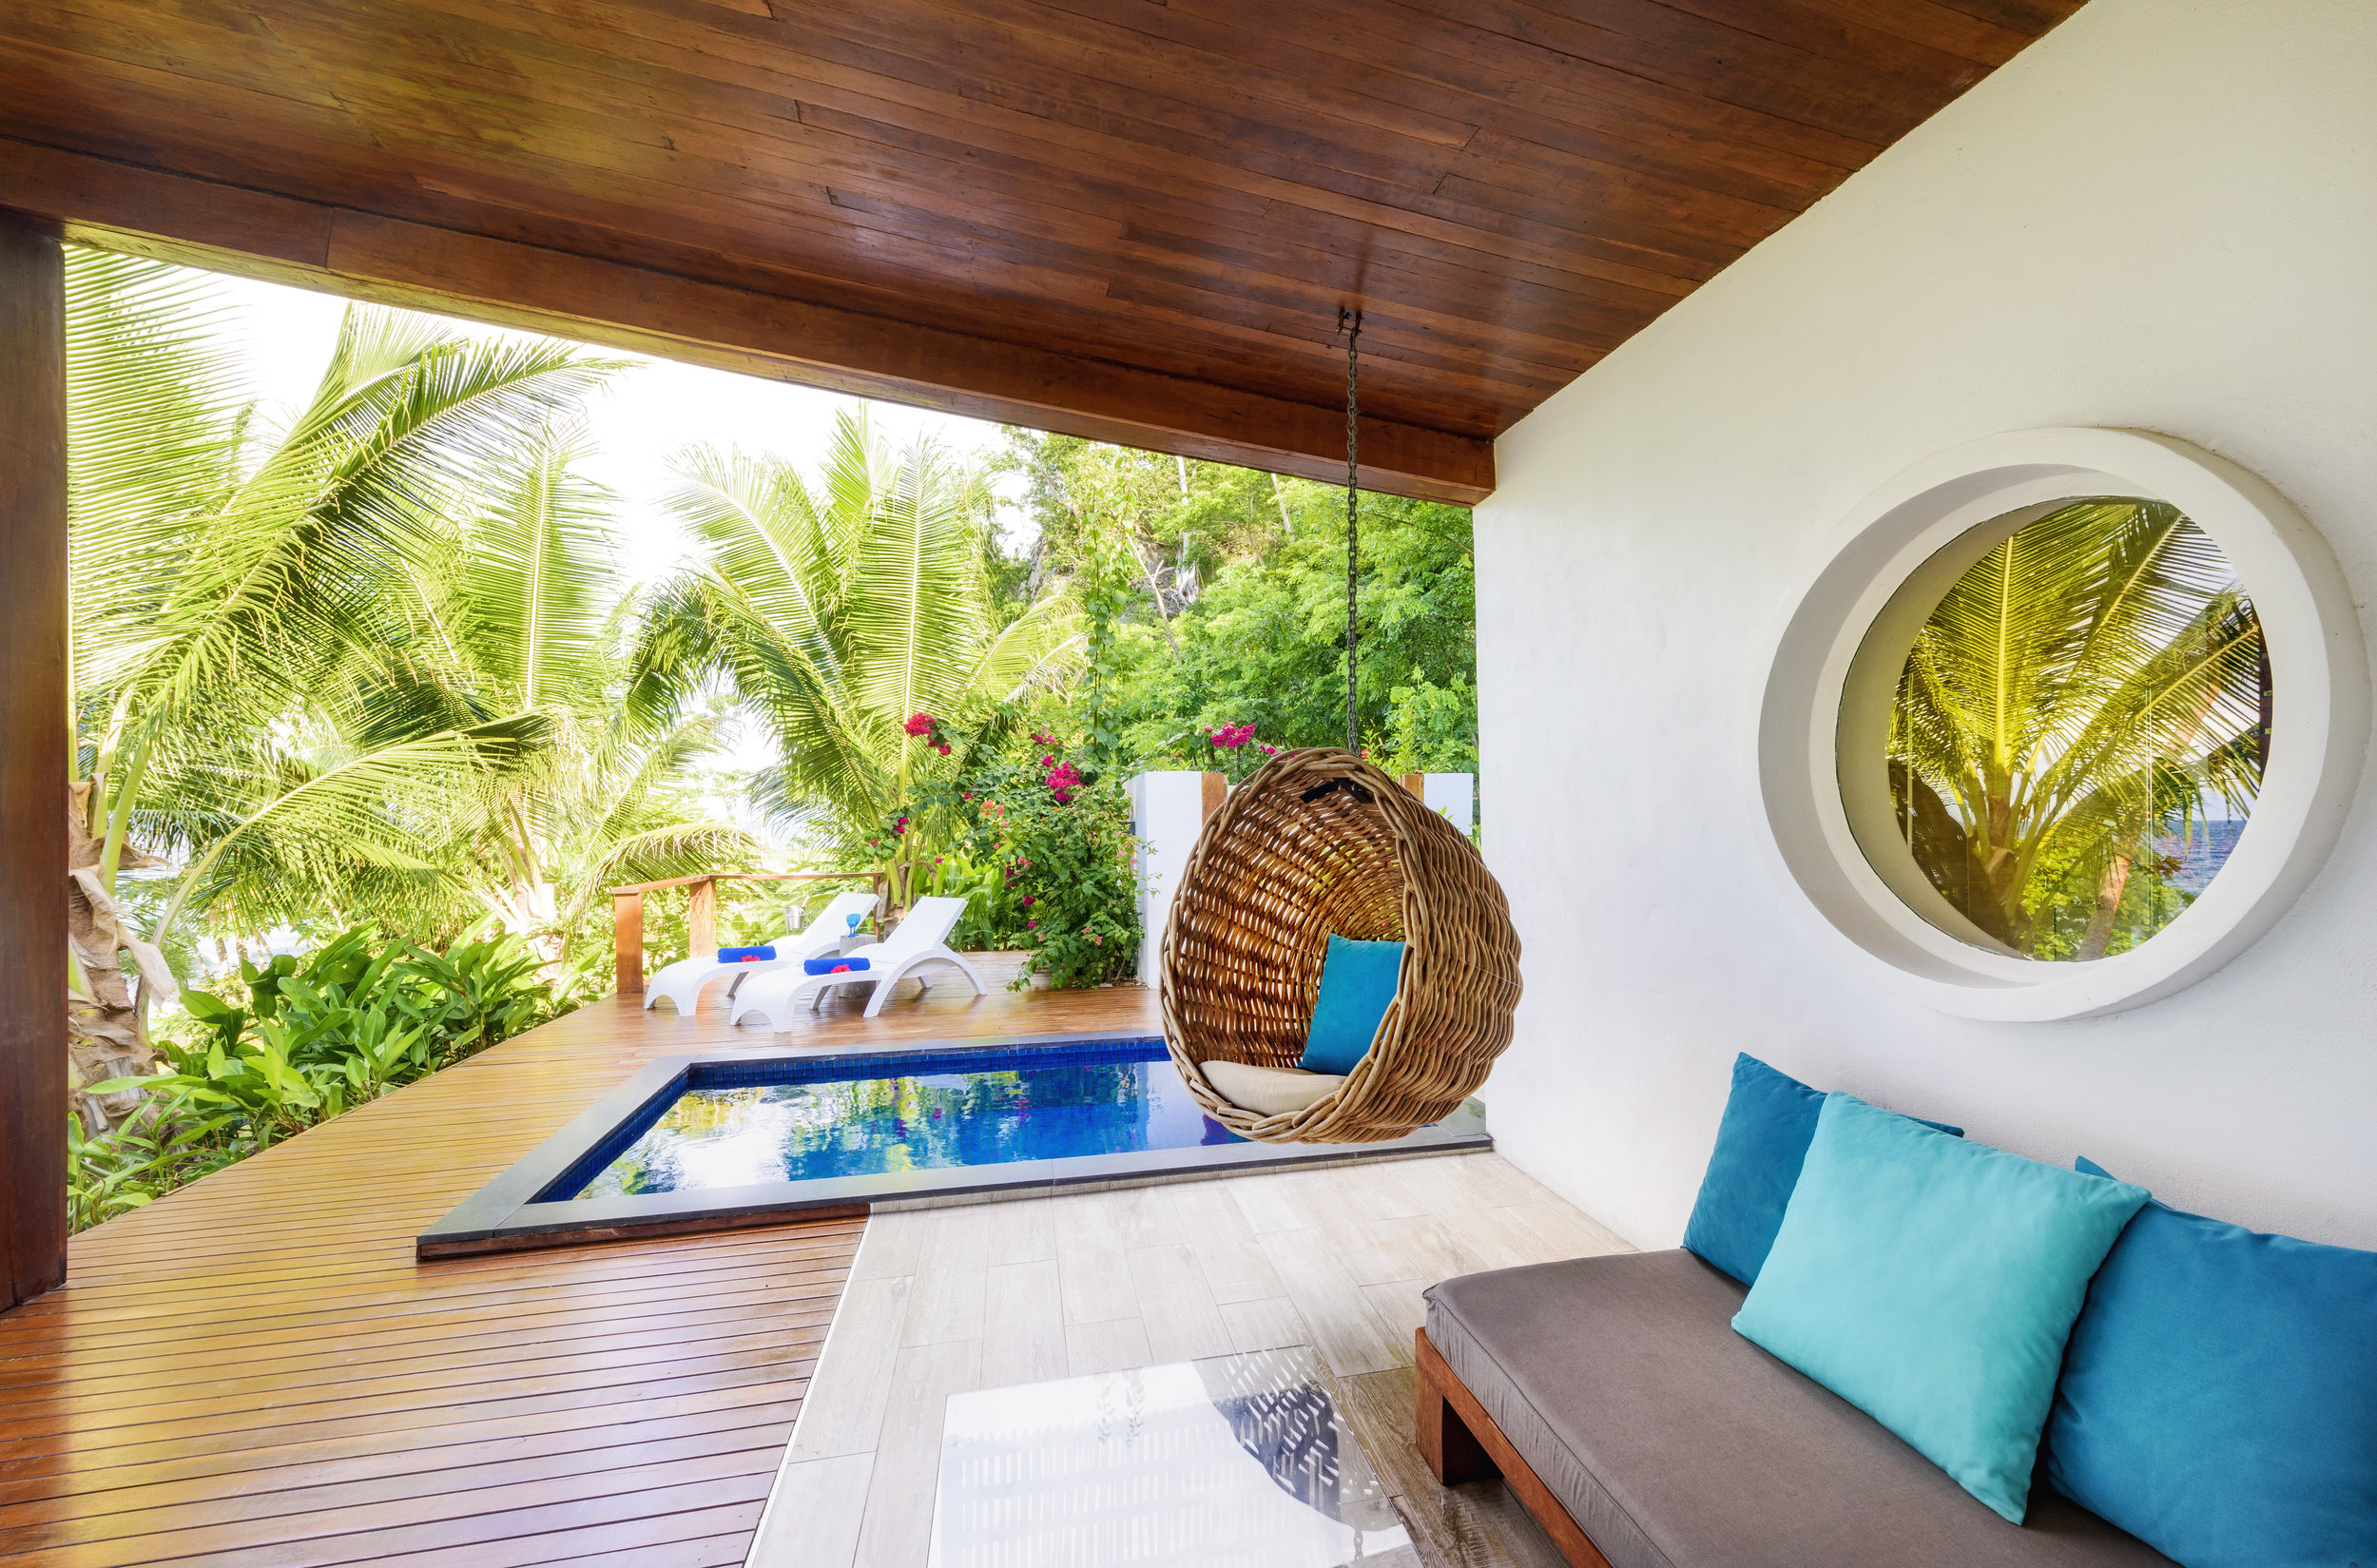 Fiji Resort - Couples Accommodation - Royal Retreat - Honeymoon - The Remote Resort4.jpg